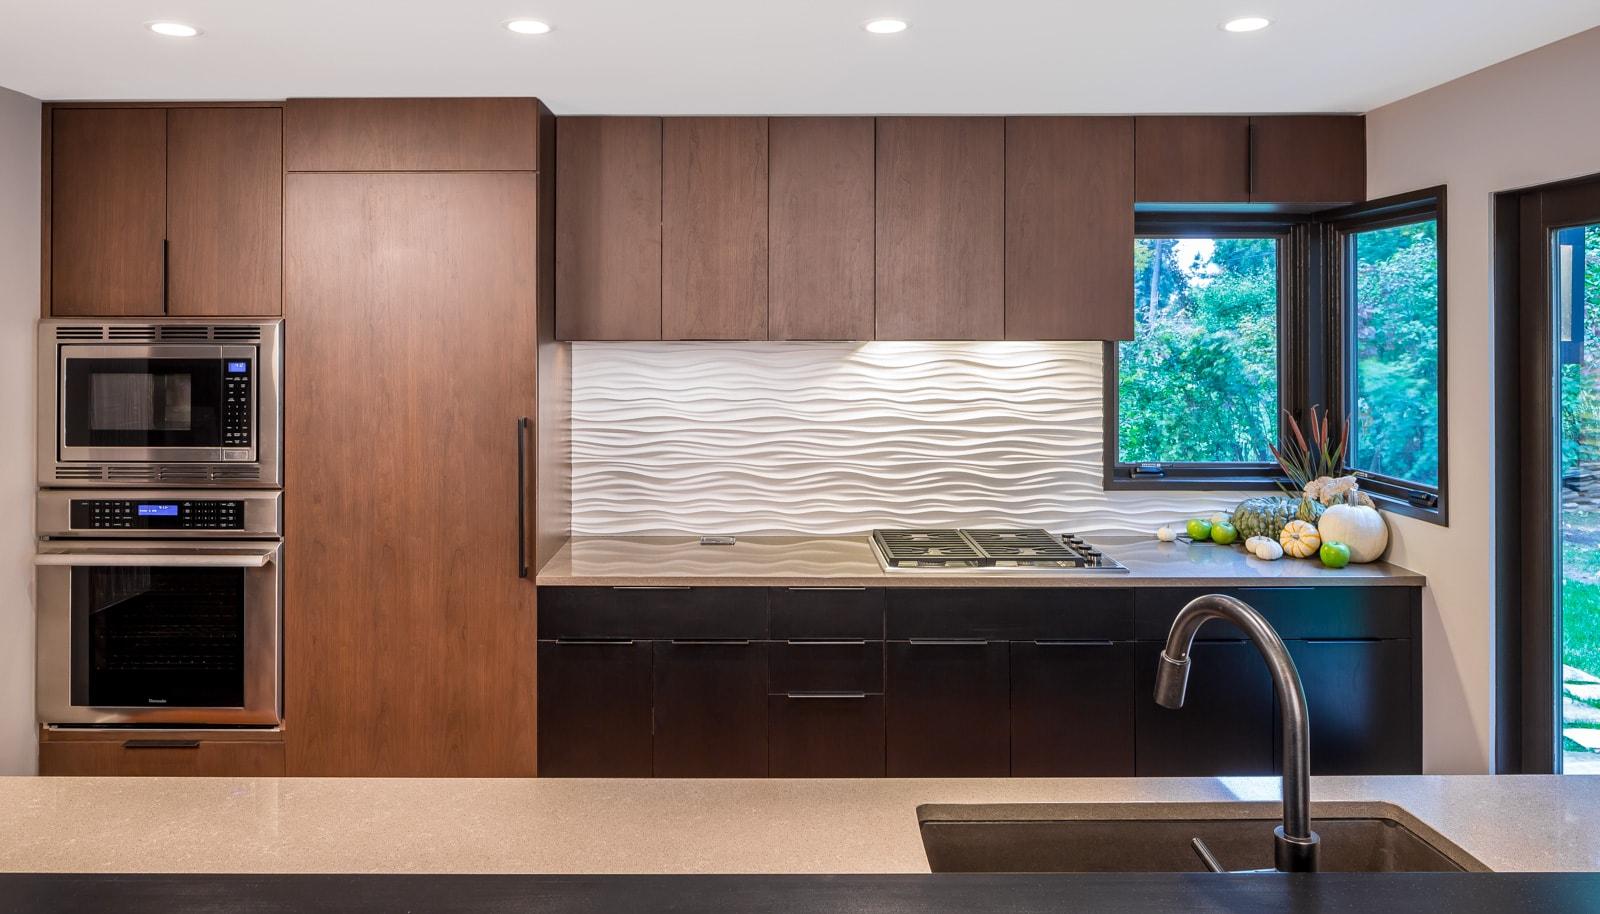 Kitchen Moy Remodel 2